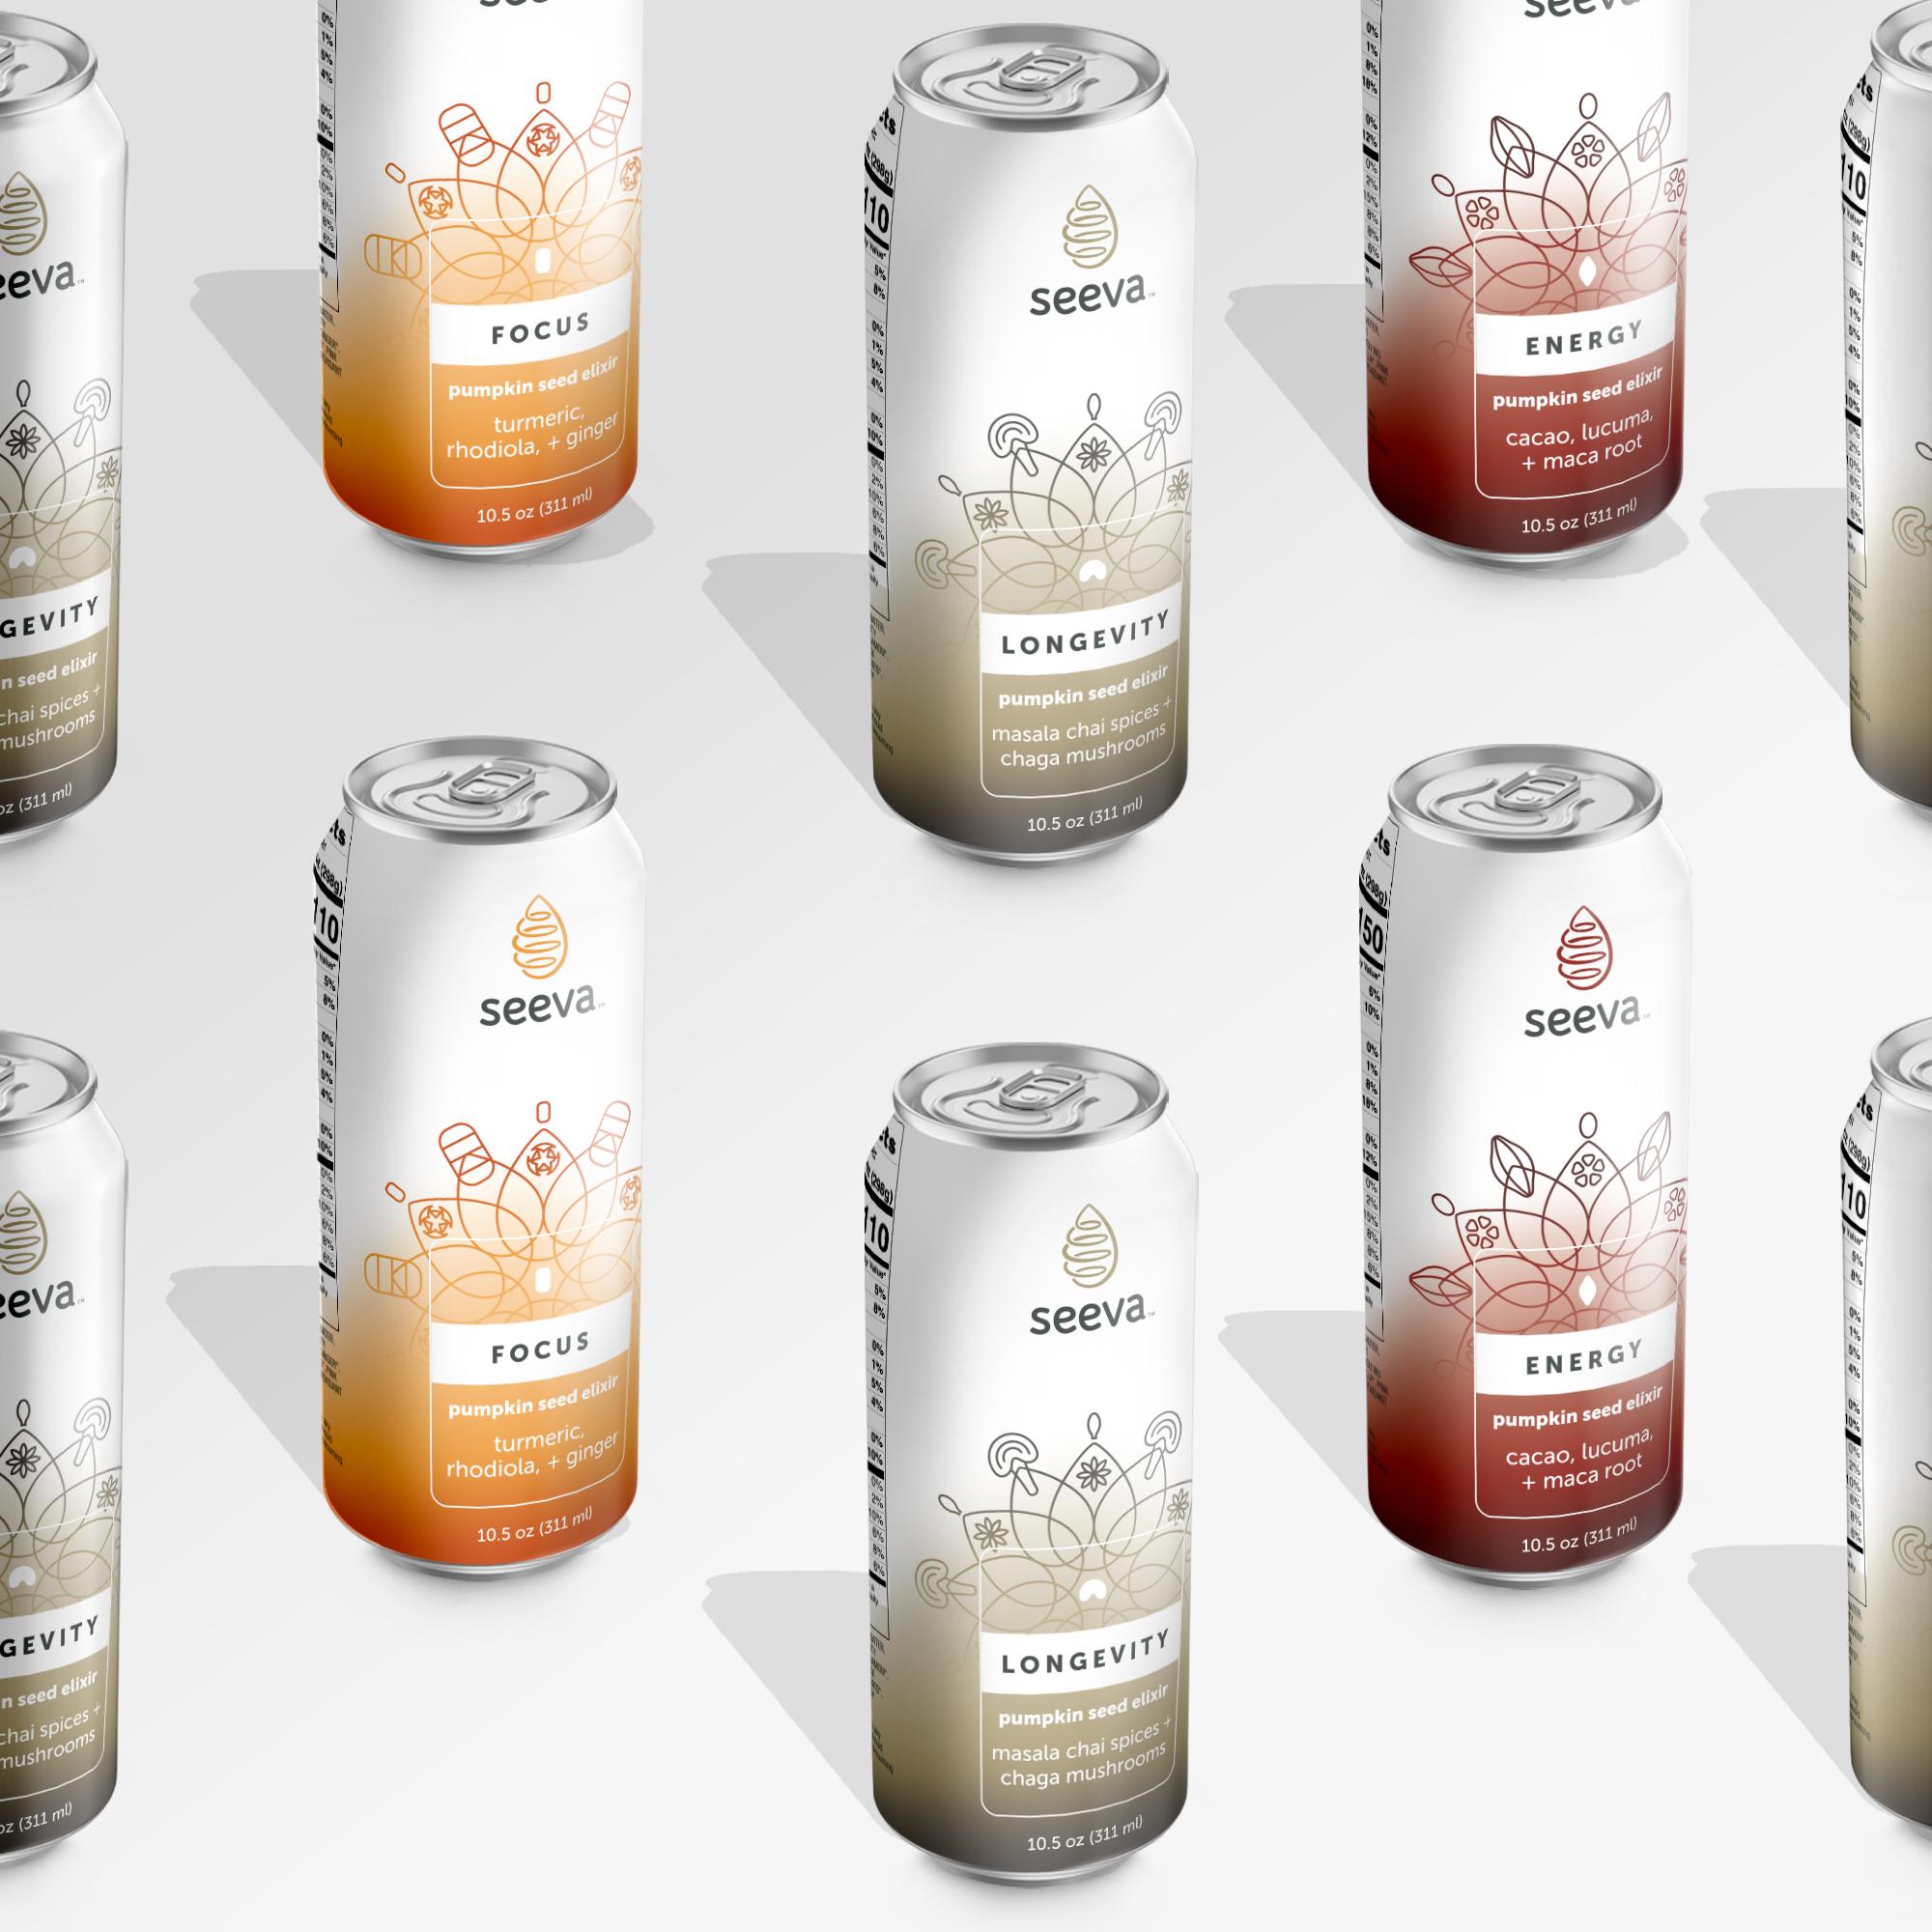 Vitamins & Supplements | Can Label Design